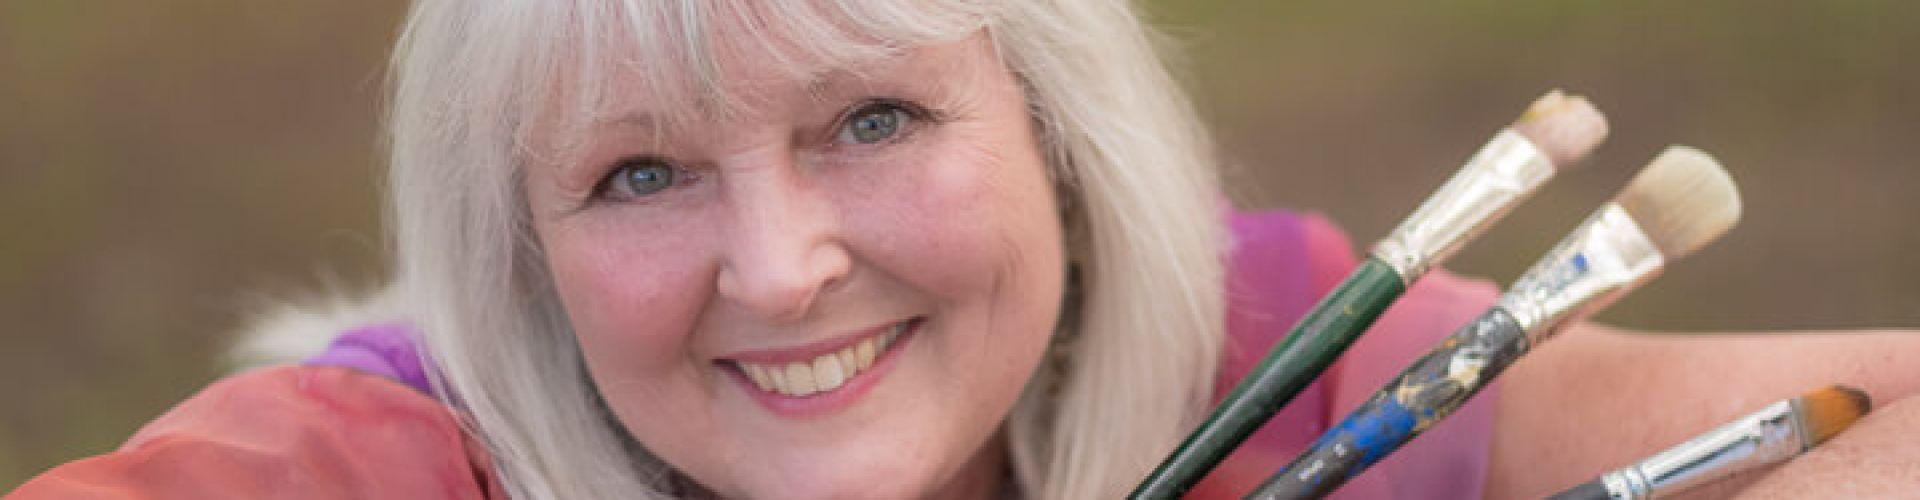 A close-up shot of Linda Lovisa while holding three paint brushes.